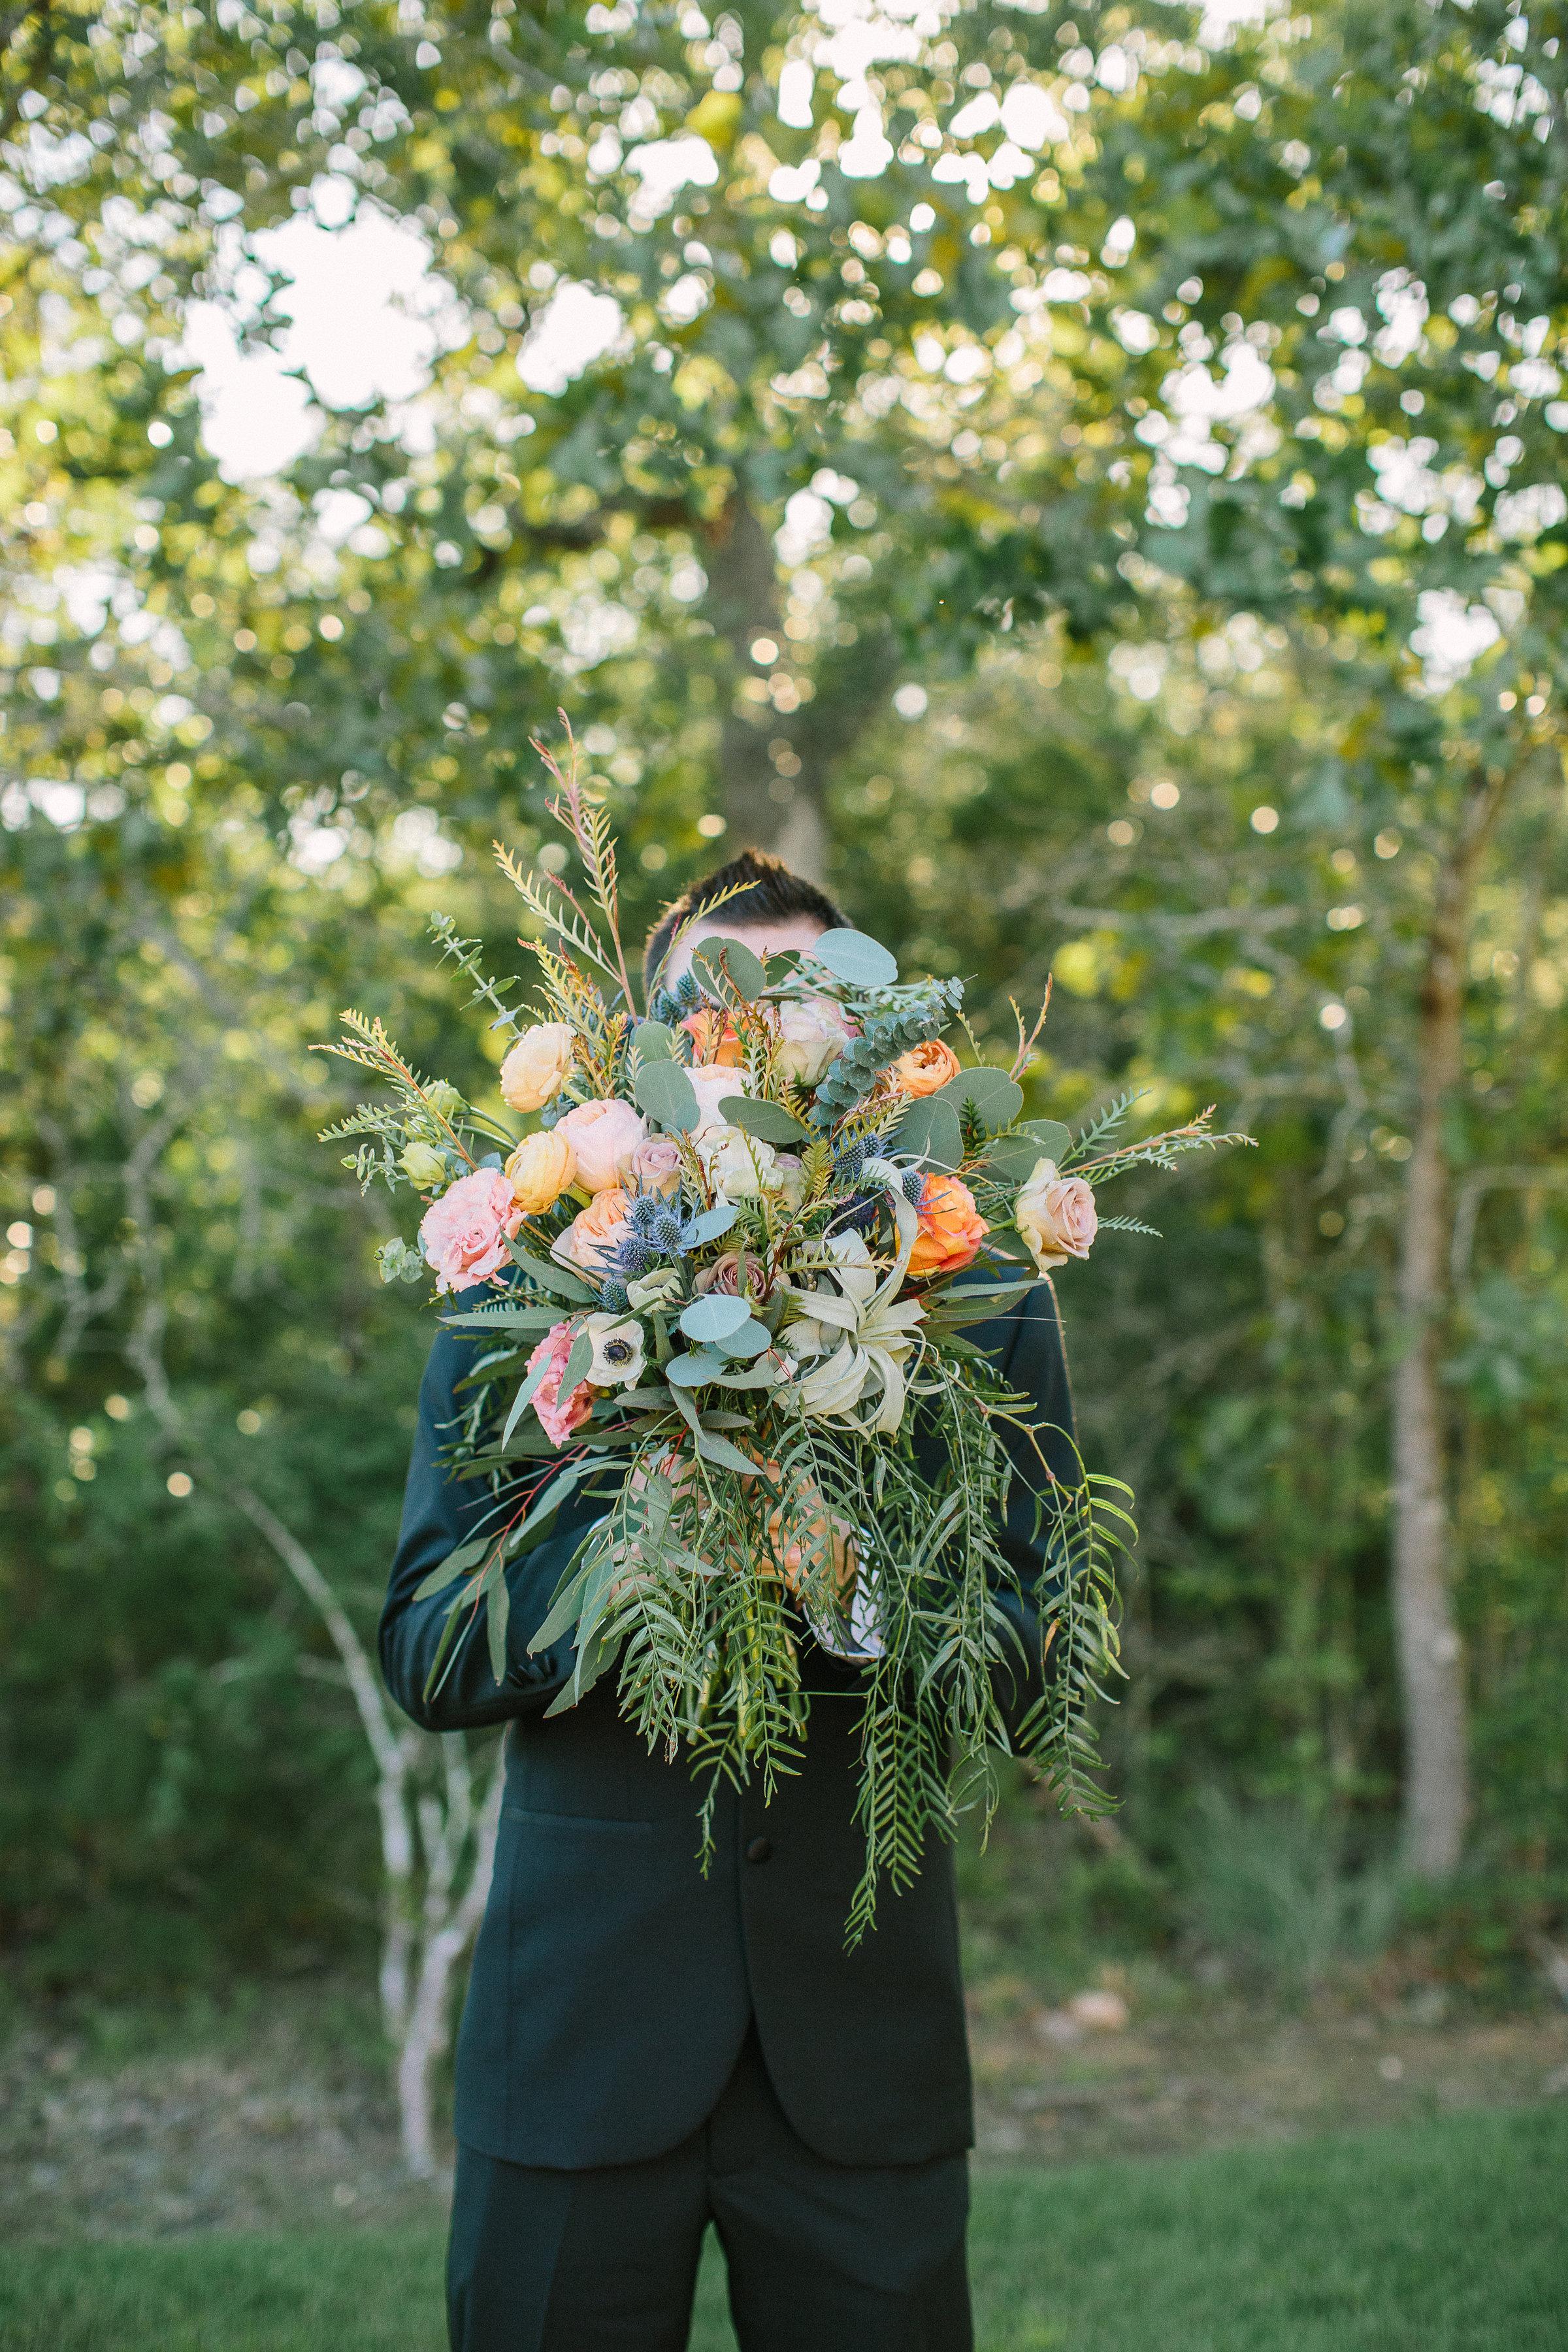 Ellen-Ashton-Photography-Peach-Creek-Ranch-Weddings-Wed-and-Prosper196